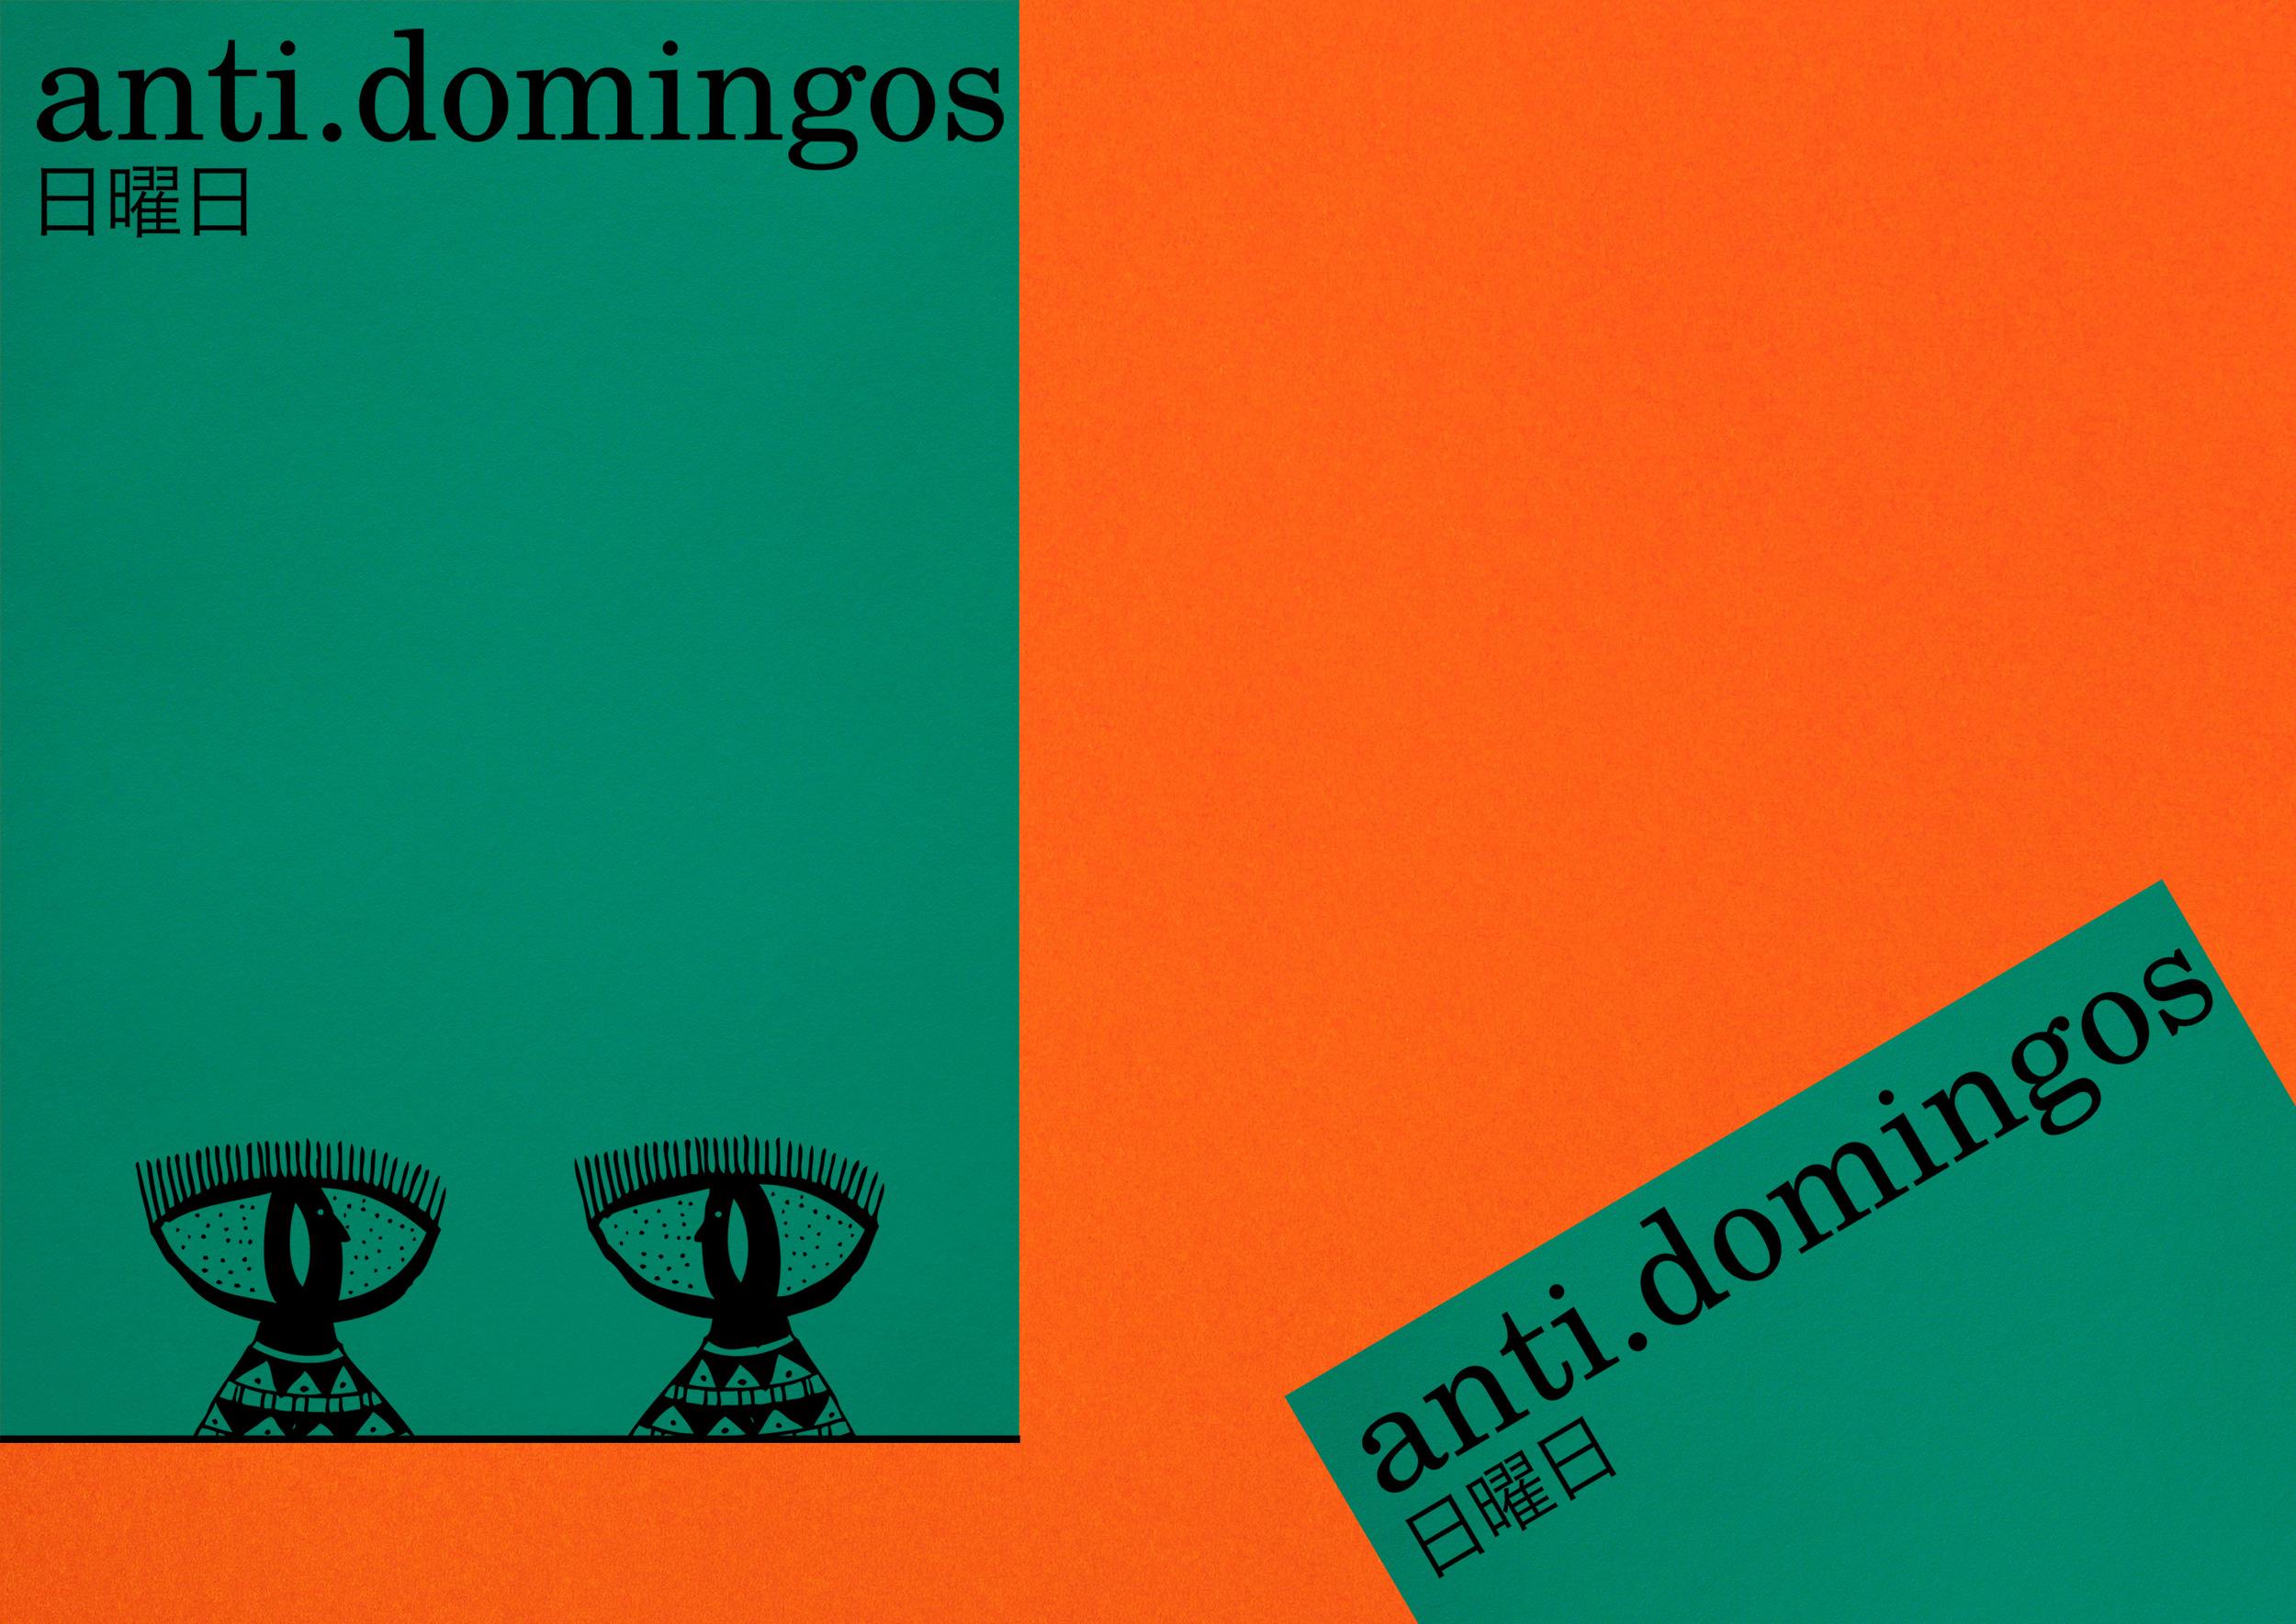 makebardo-antidomingos-2019-3.jpg